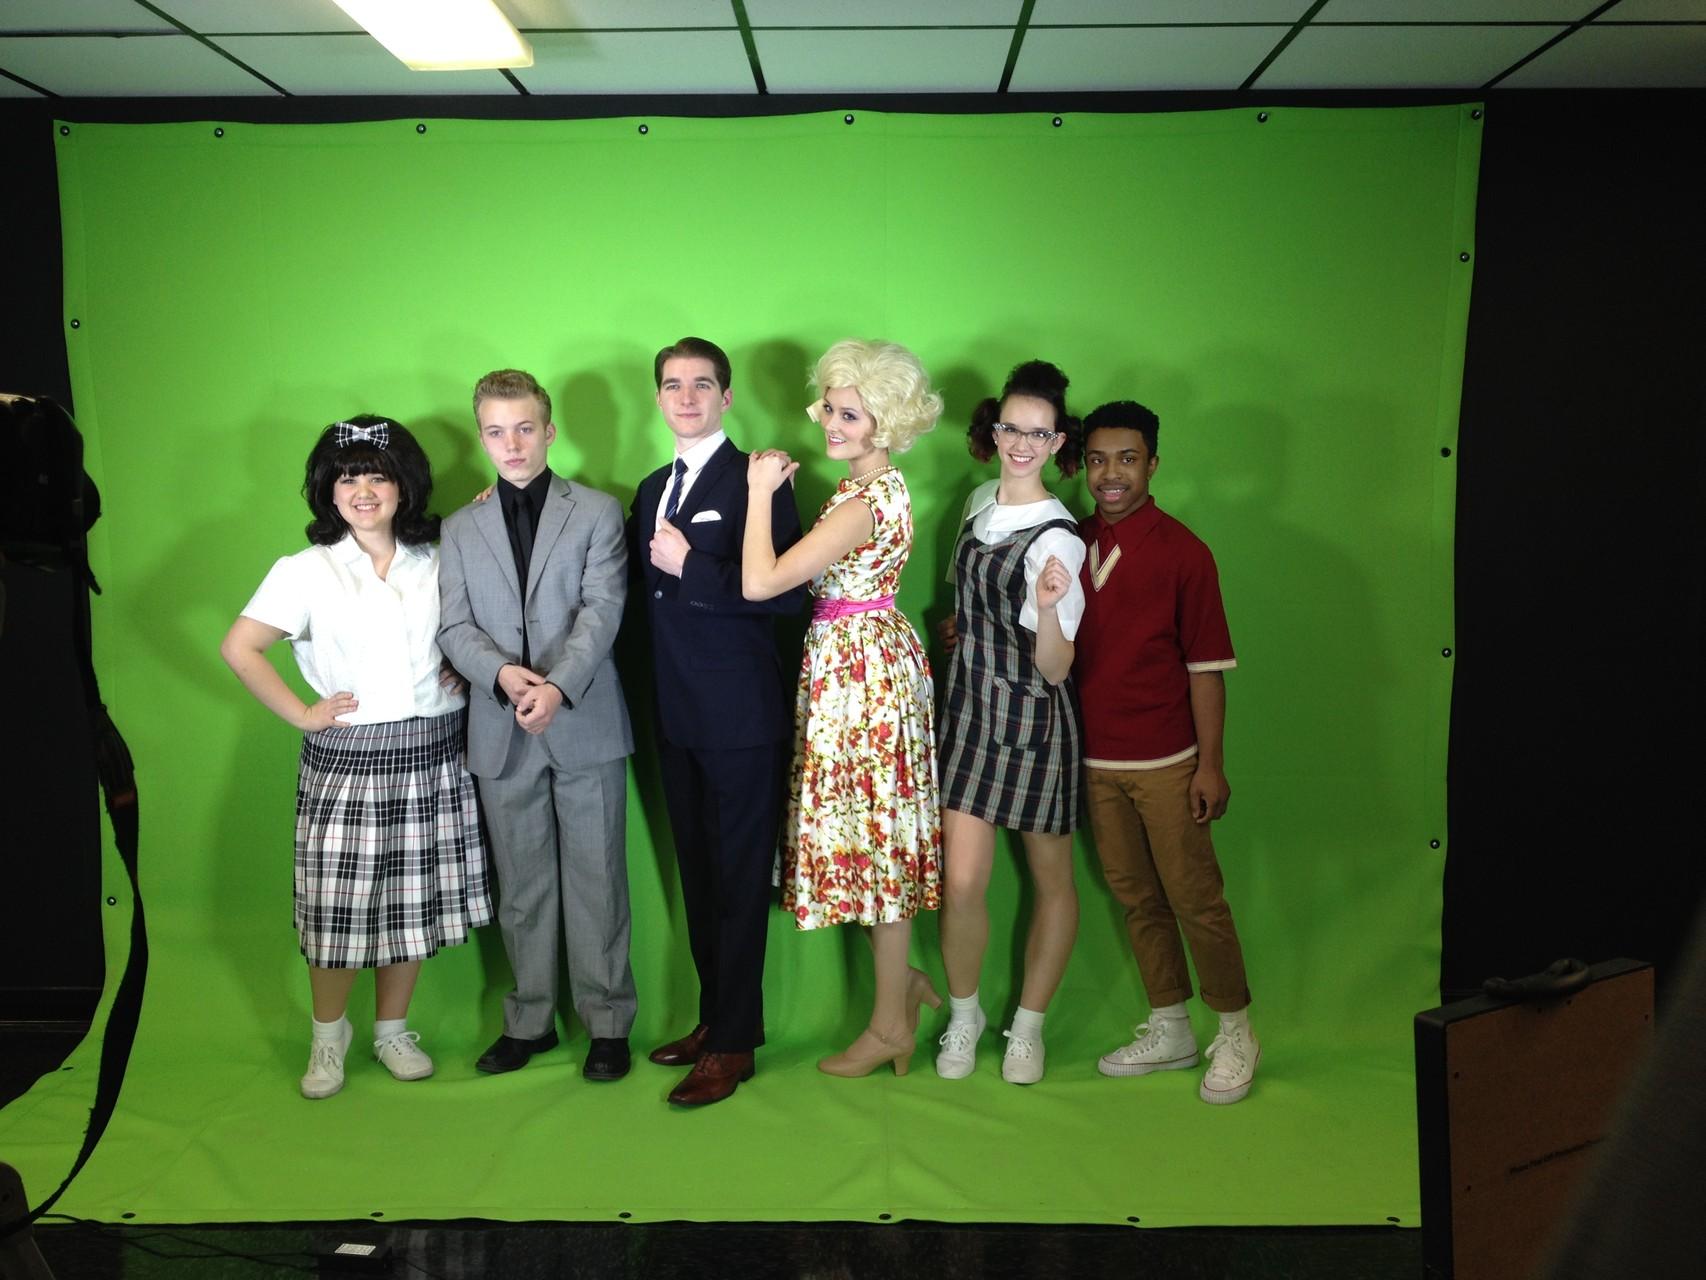 Greenscreenshooting für 'Hairspray' Musical